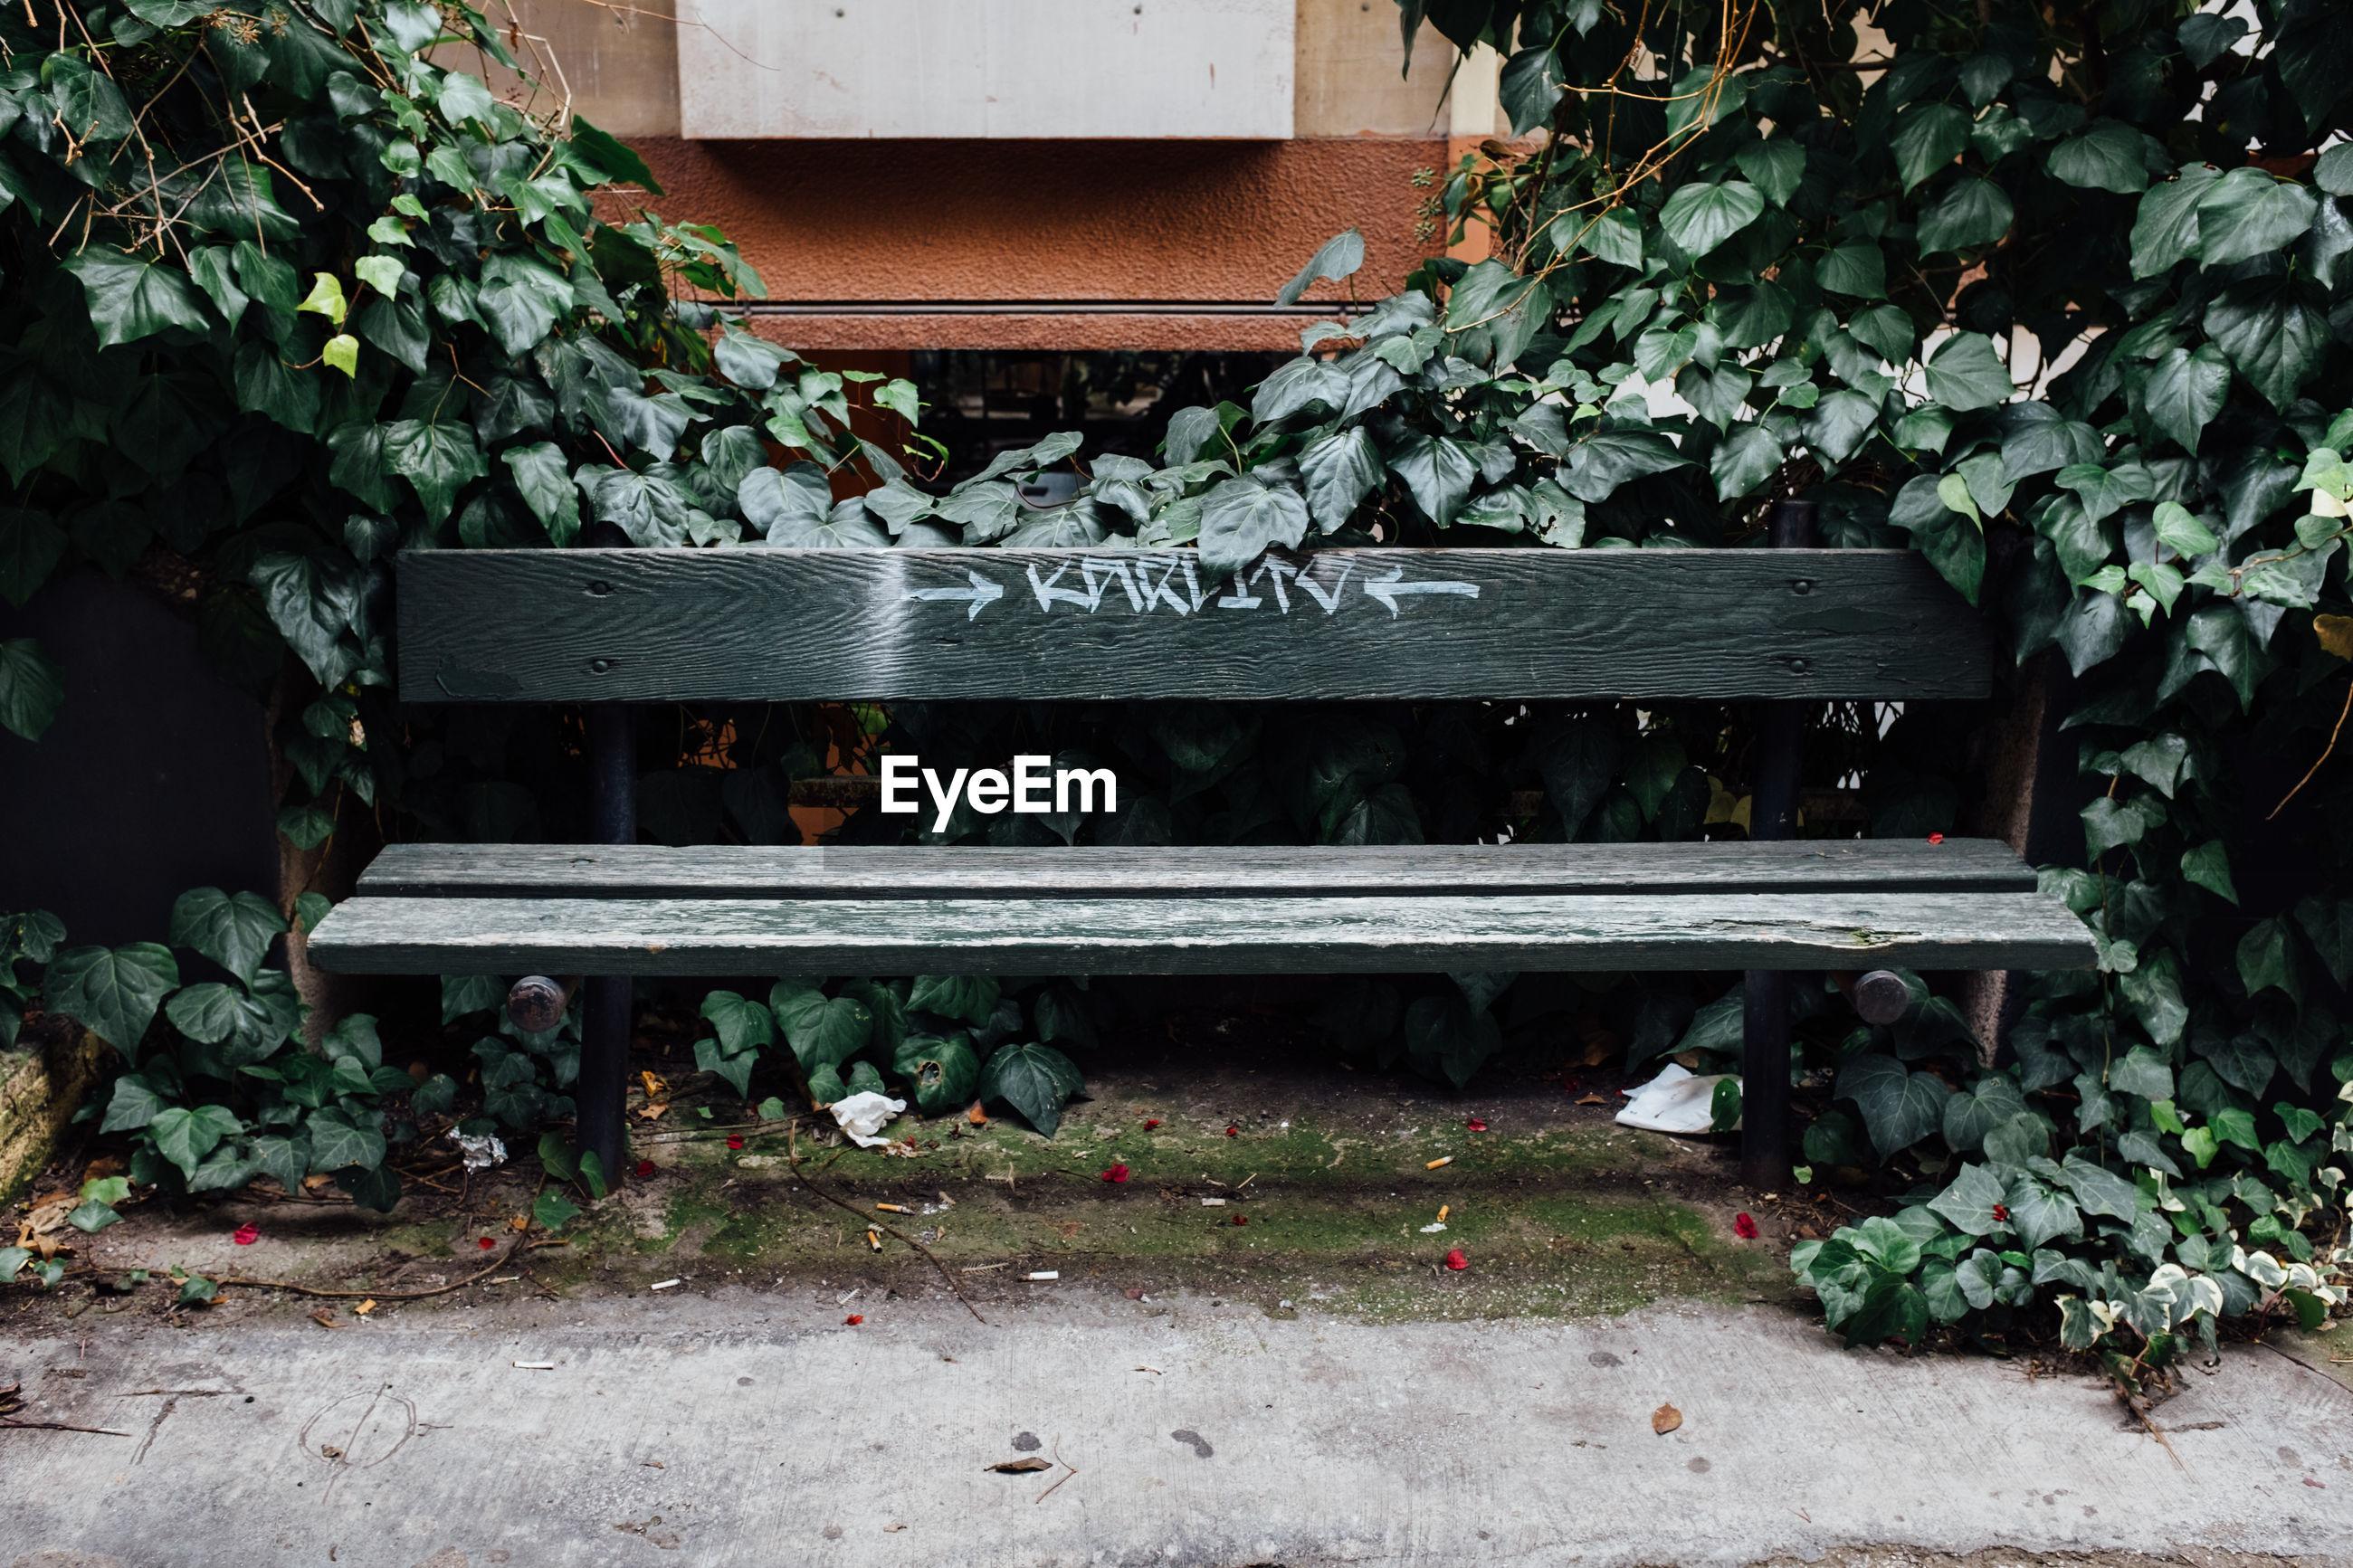 EMPTY BENCH BY PLANTS IN YARD